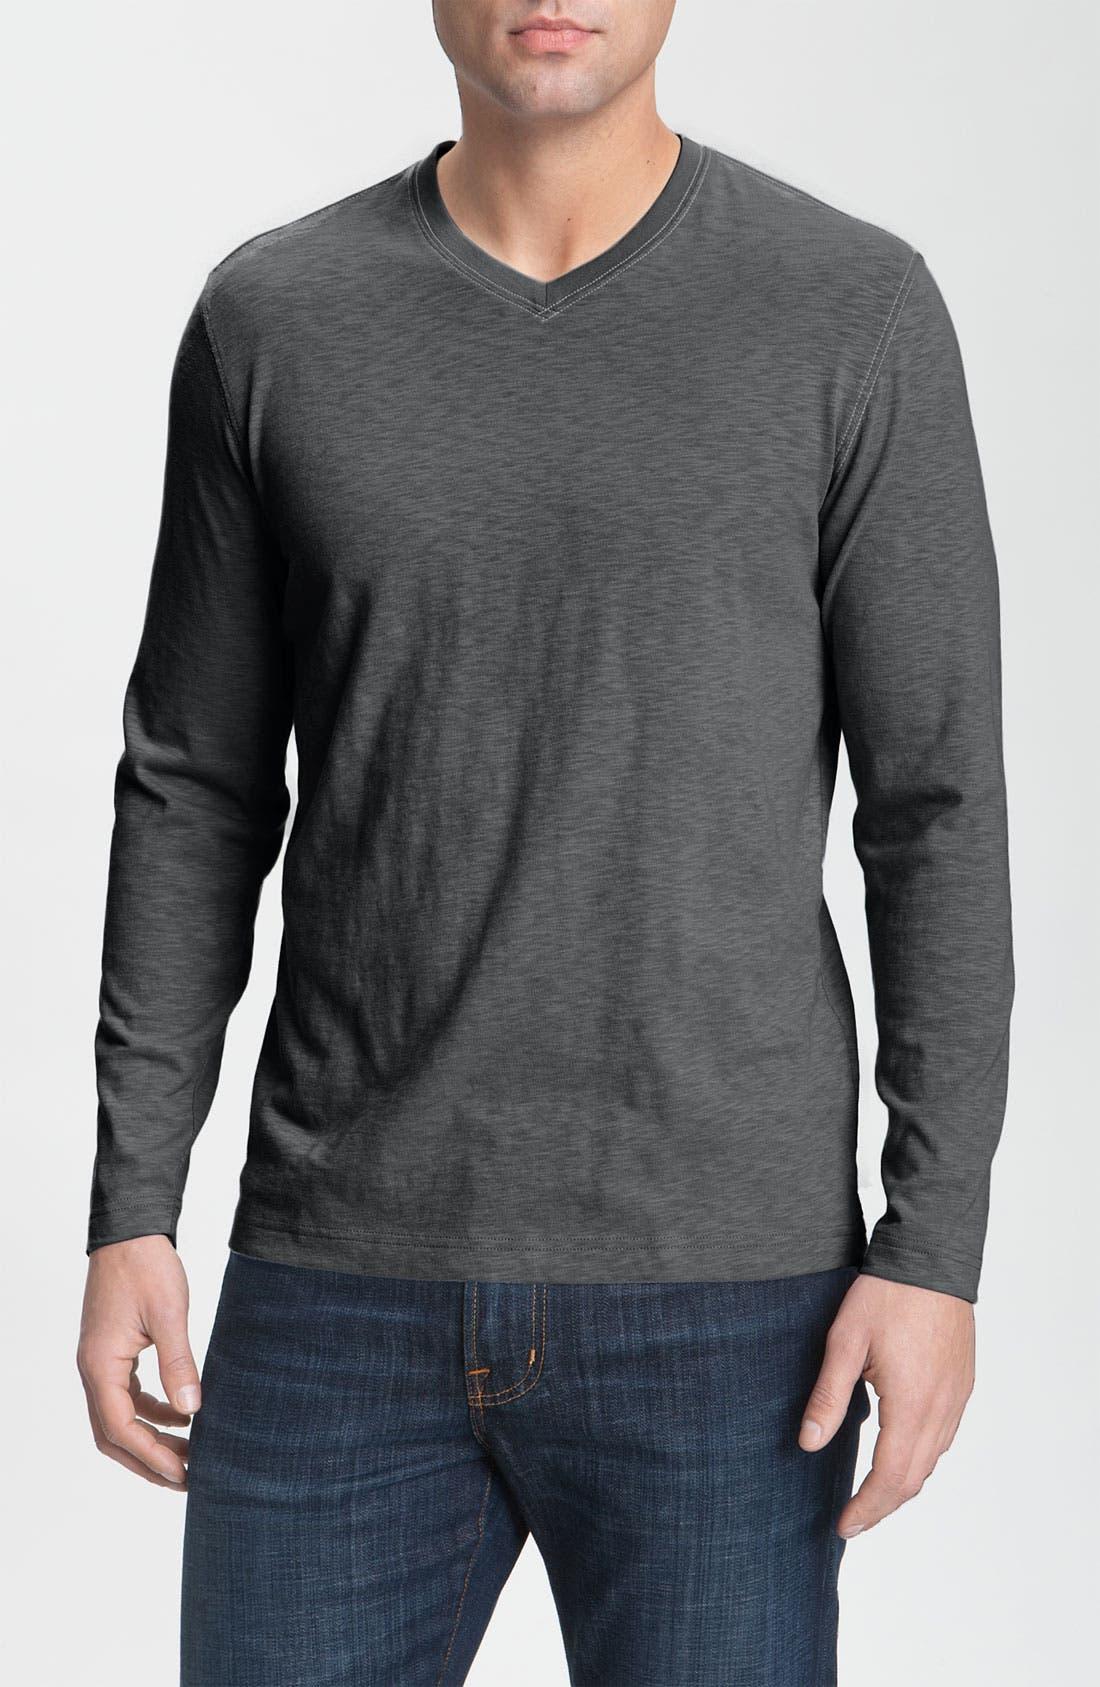 Main Image - Robert Barakett 'Miami' Long Sleeve T-Shirt